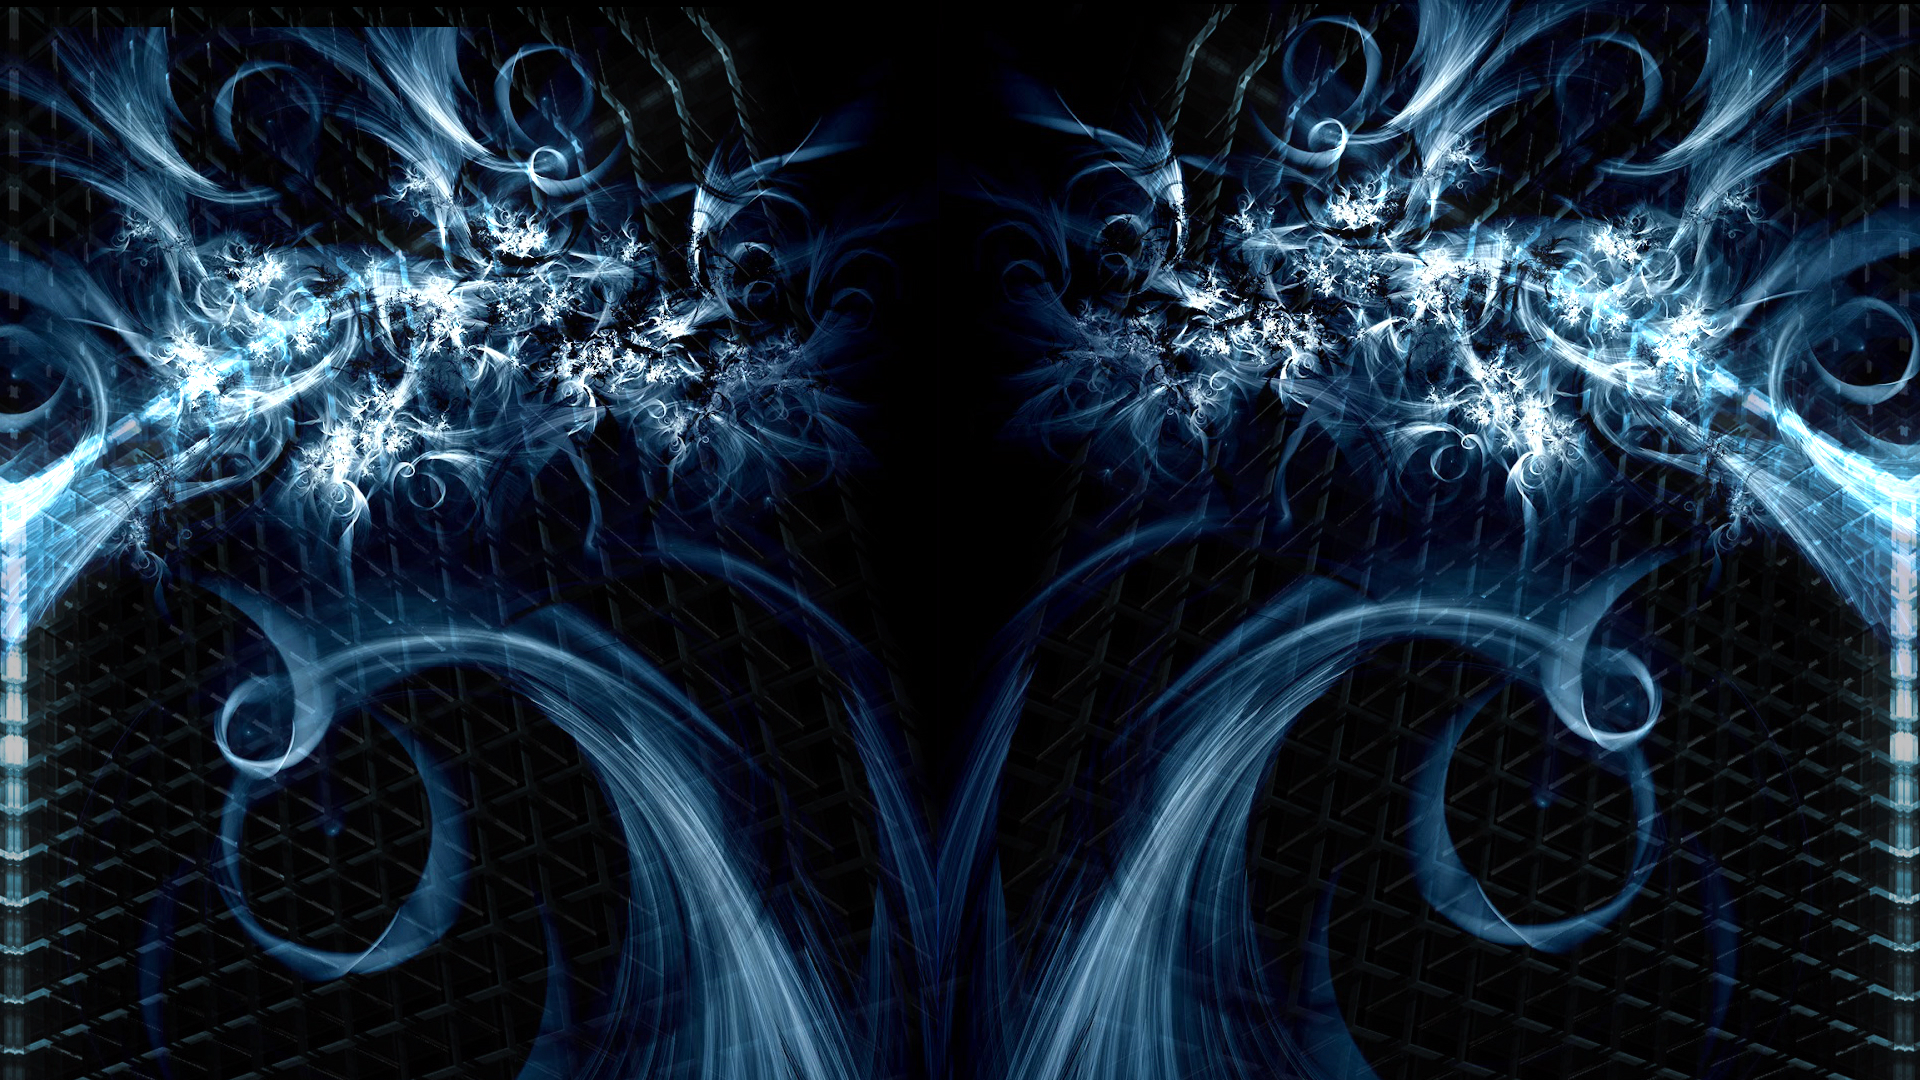 Cyber frost hd wallpaper background image 1920x1080 - Cyber wallpaper ...